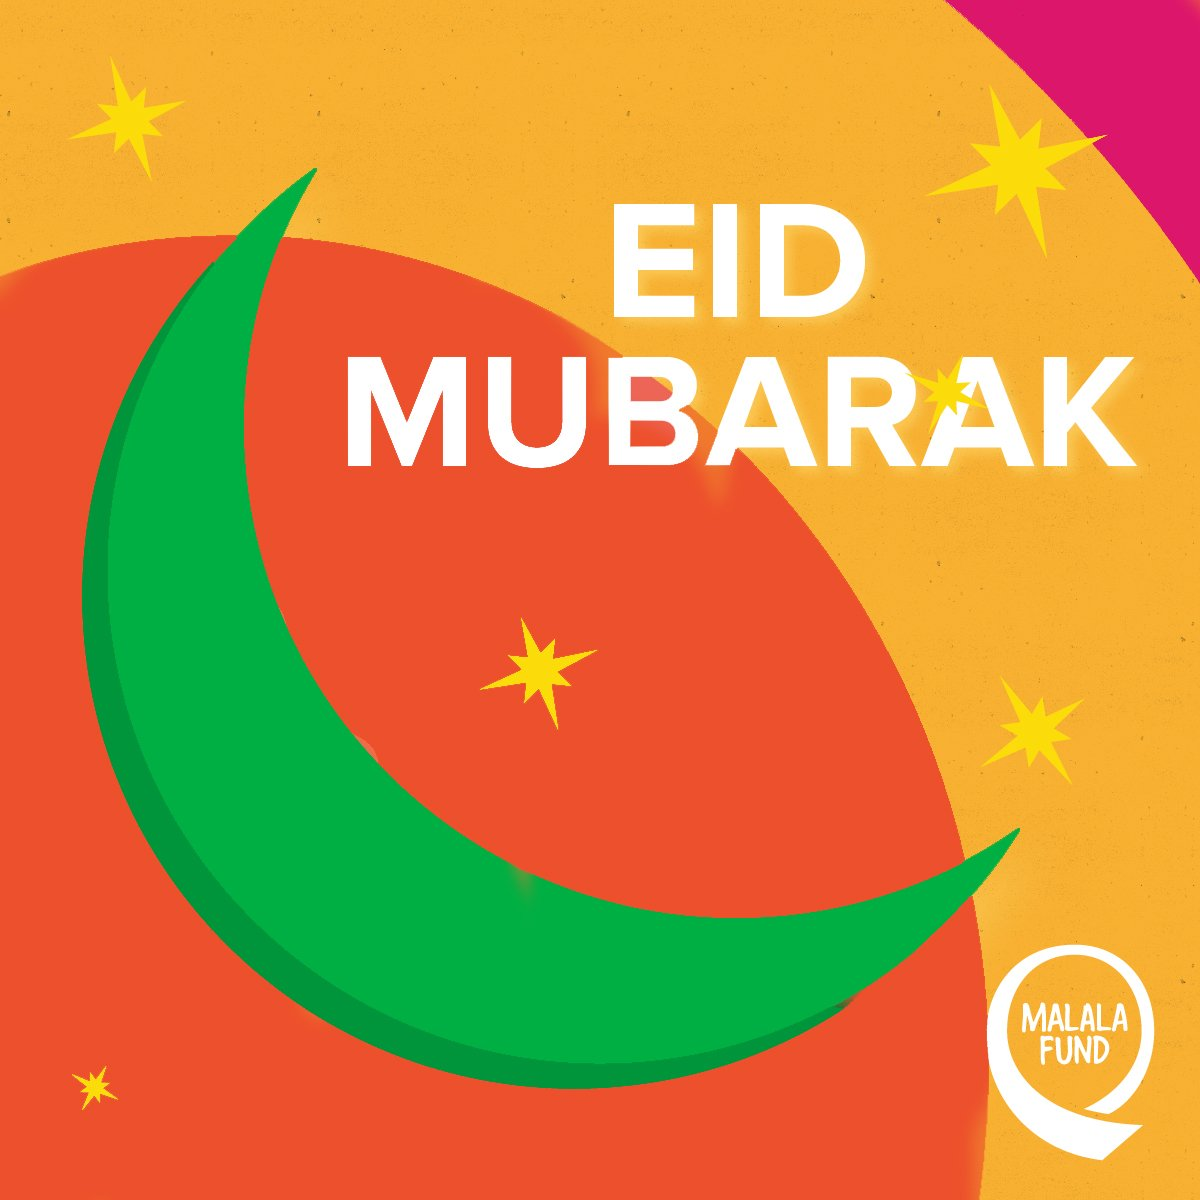 Wishing you a very happy #EidAlFitr. ✨✨